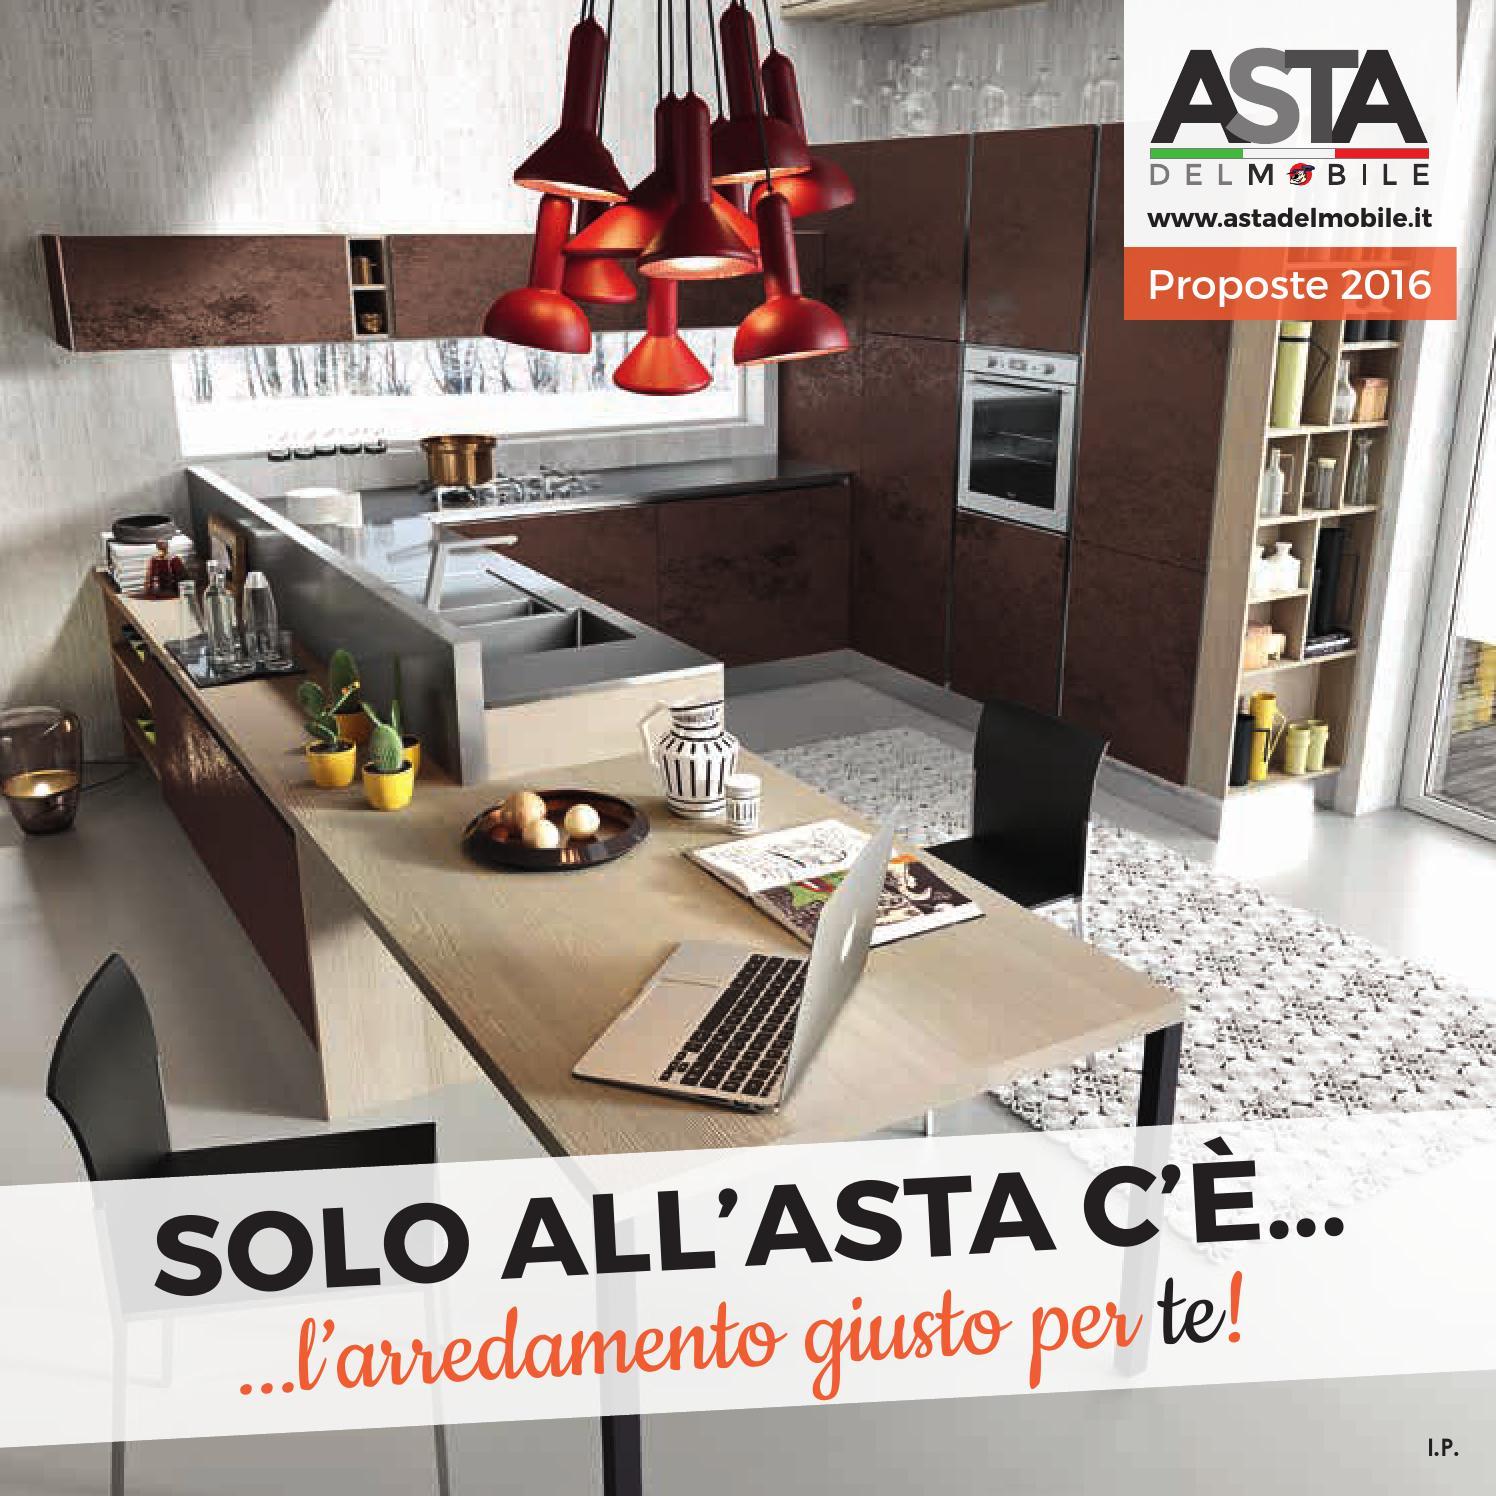 Catalogo asta del mobile 2016 by input Torino srl - issuu